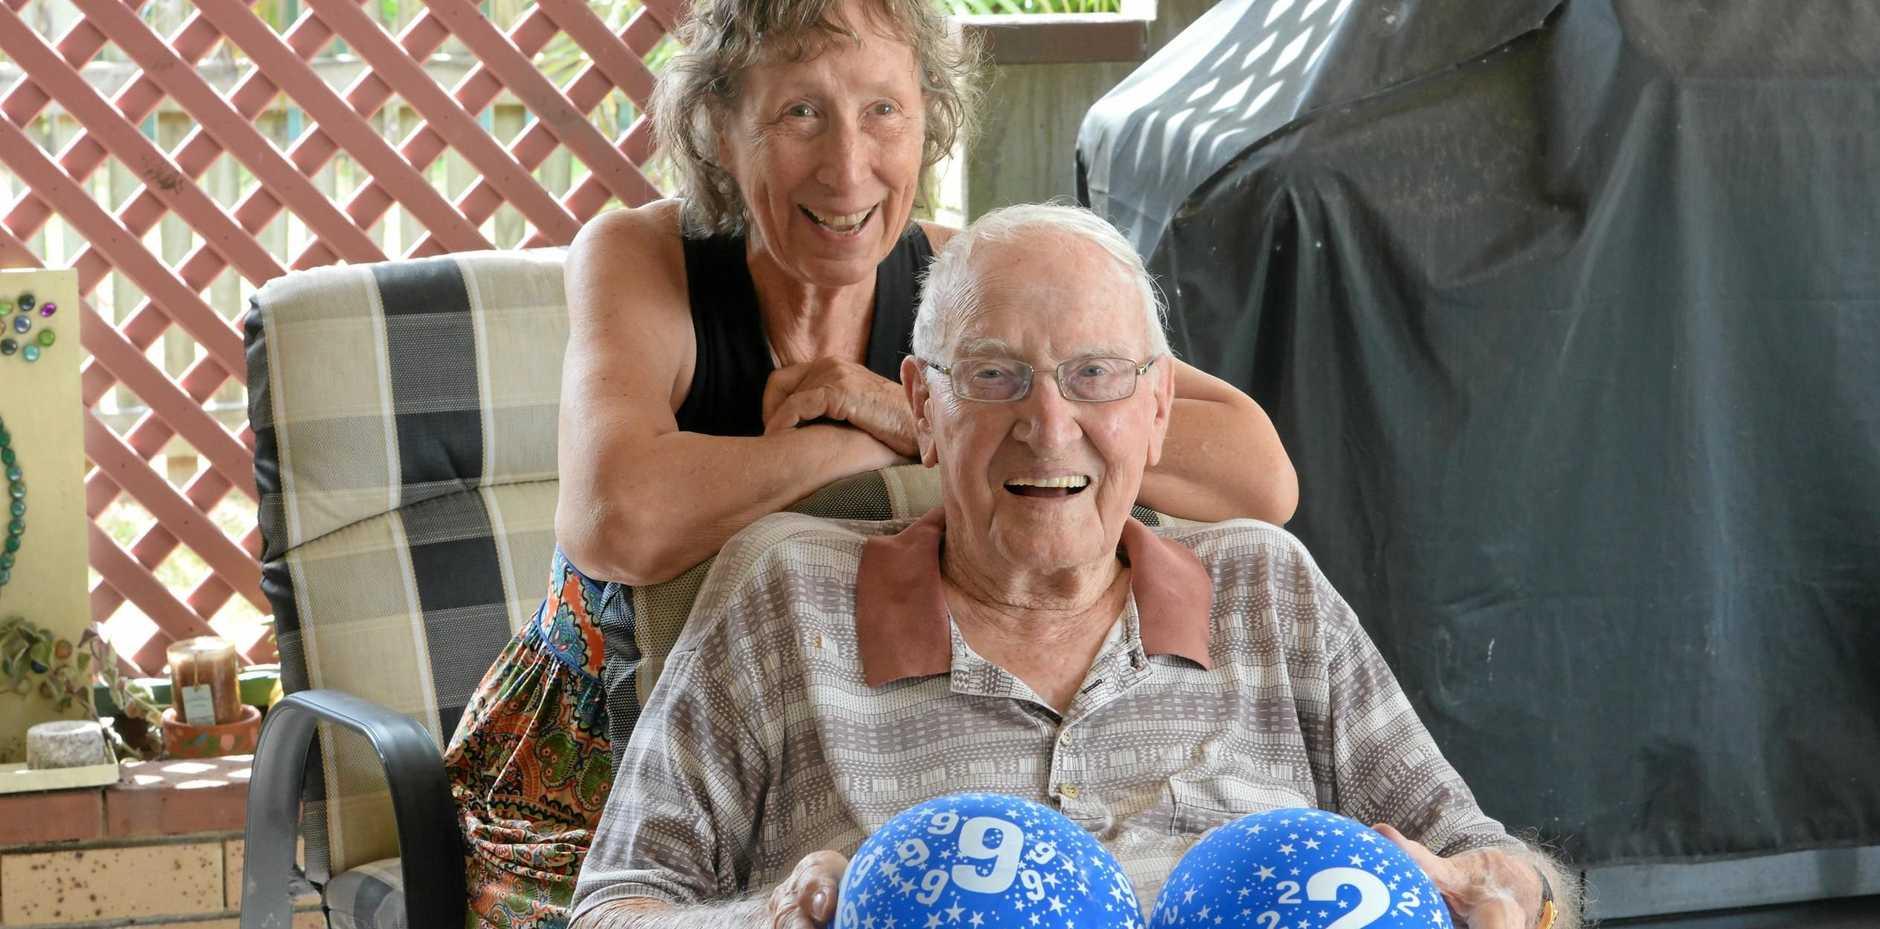 Ken Alden and Jill (nee Ford) Alden have celebrated Ken's 92nd birthday.